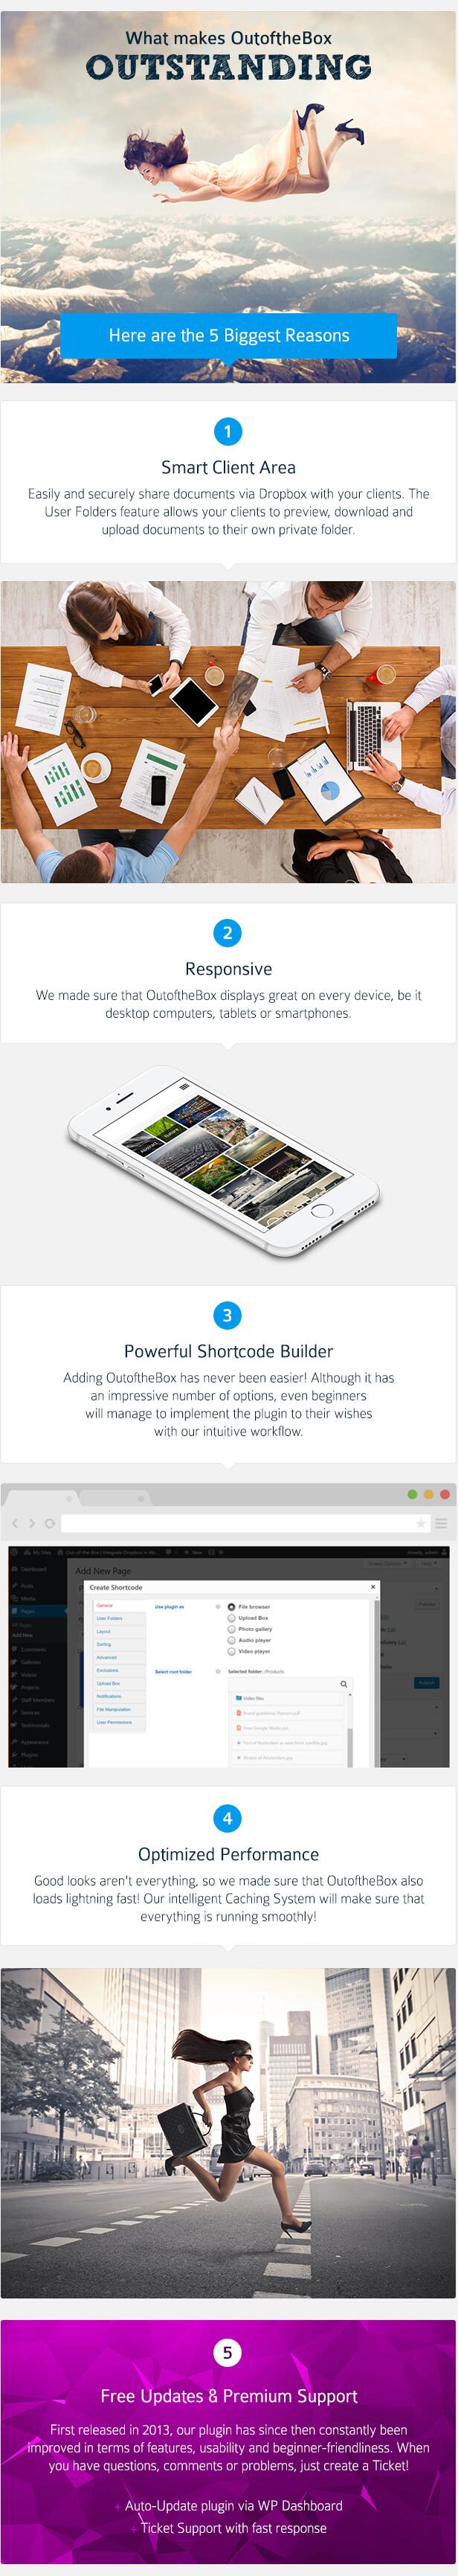 dropbox7 - Out-of-the-Box   Dropbox plugin for WordPress